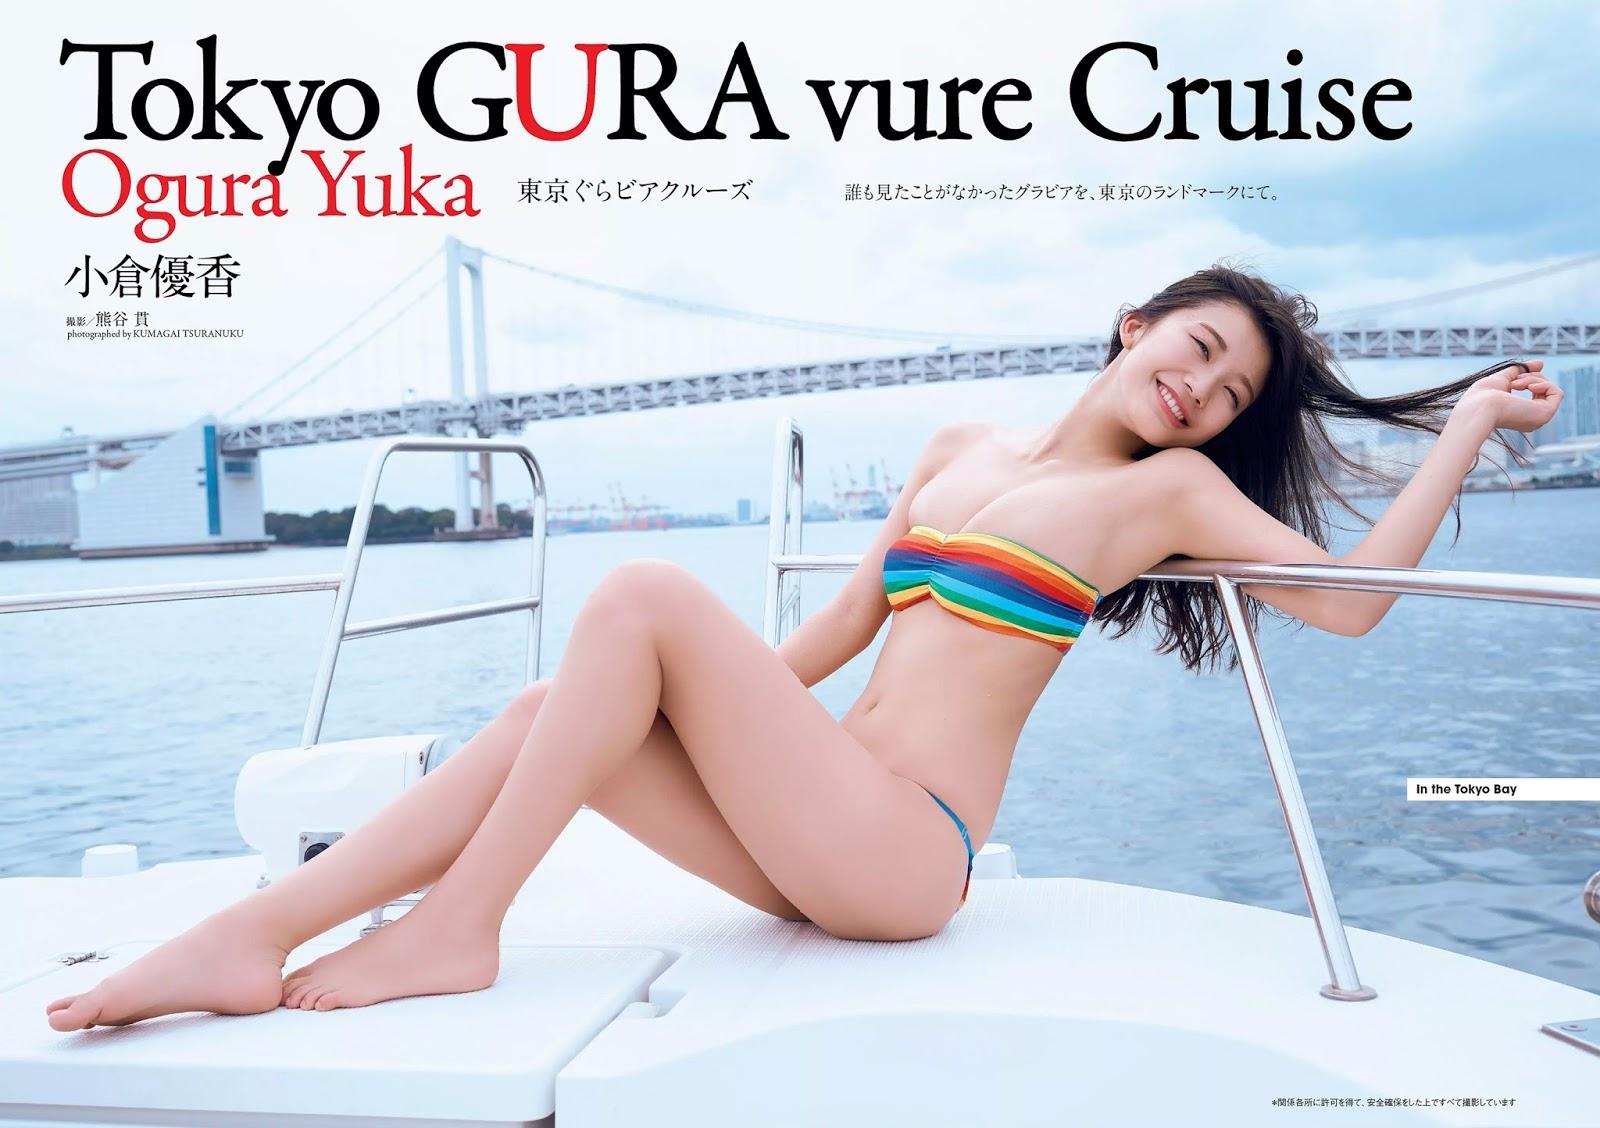 Yuka Ogura 小倉優香, Weekly Playboy 2017 No.43 (週刊プレイボーイ 2017年43号)